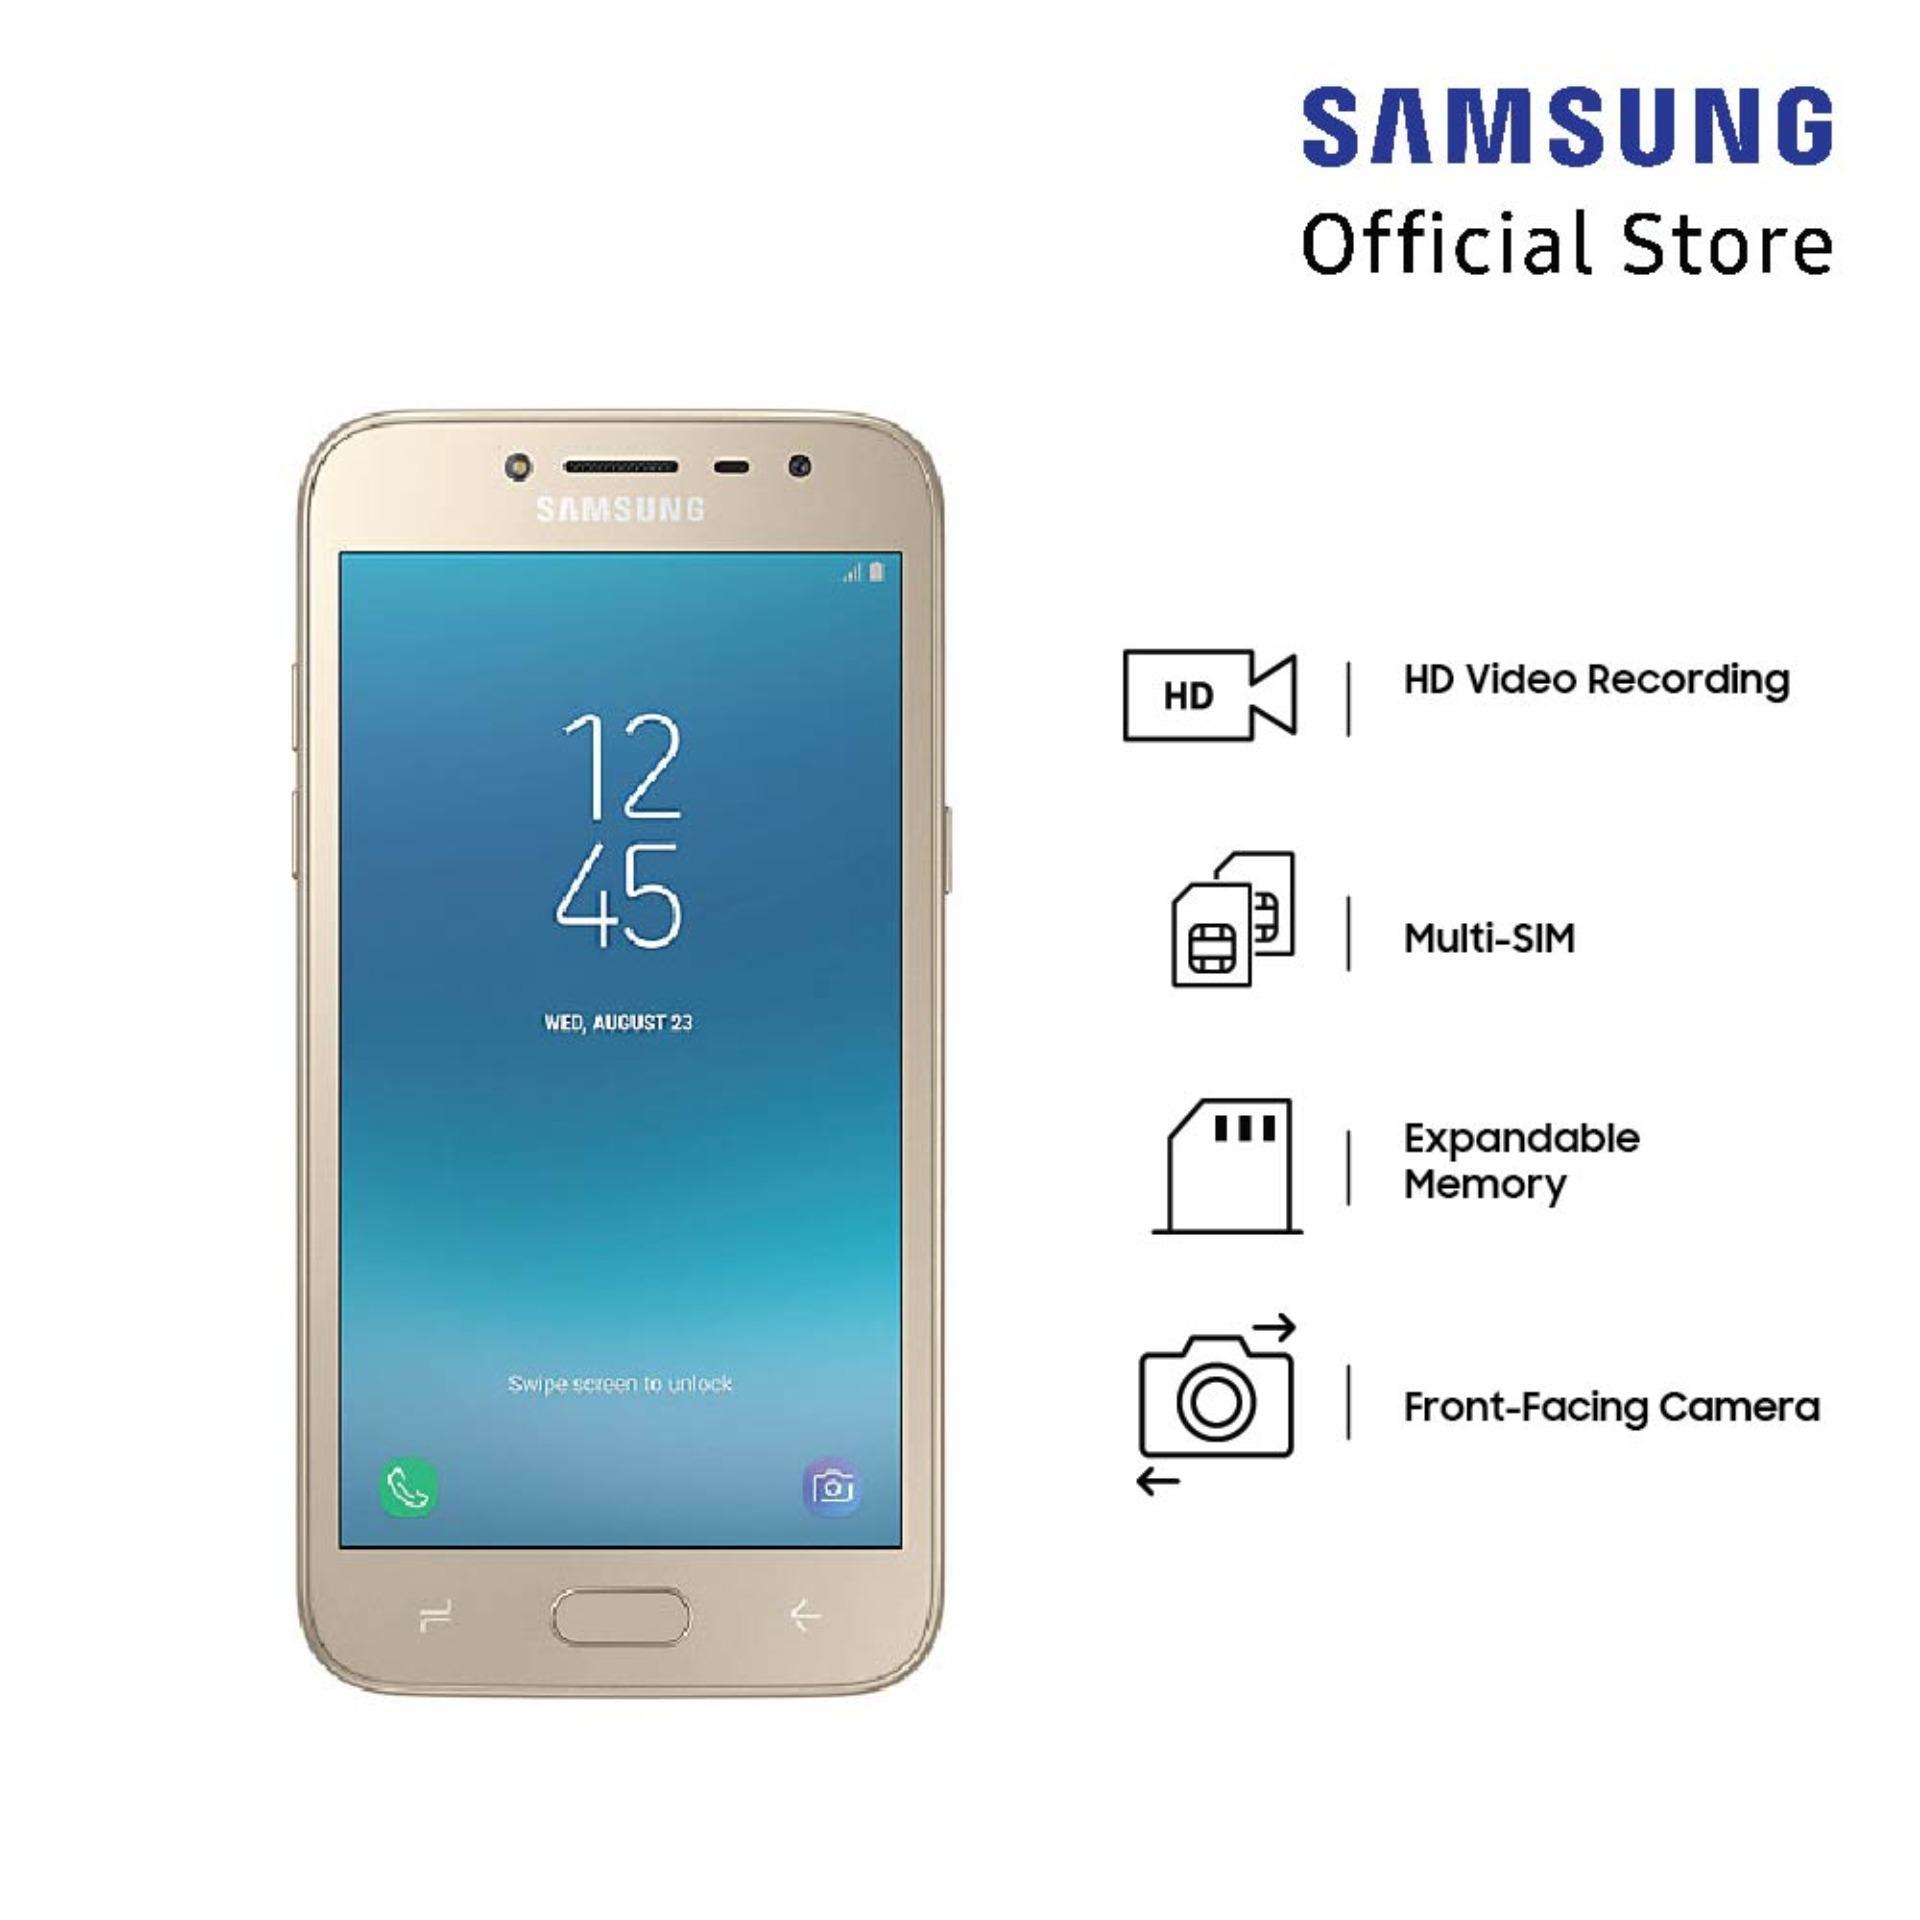 Samsung Galaxy J2 Pro Gold 1.5/16 GB